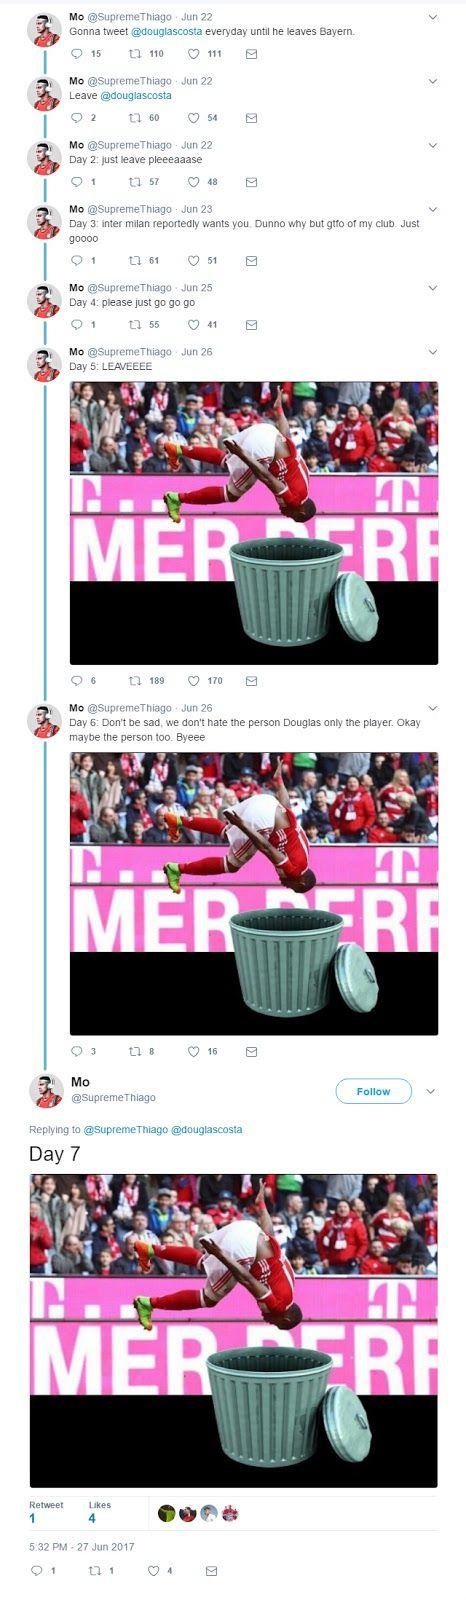 Desperate Bayern Munich fan tweeting Douglas Costa every day until he leaves